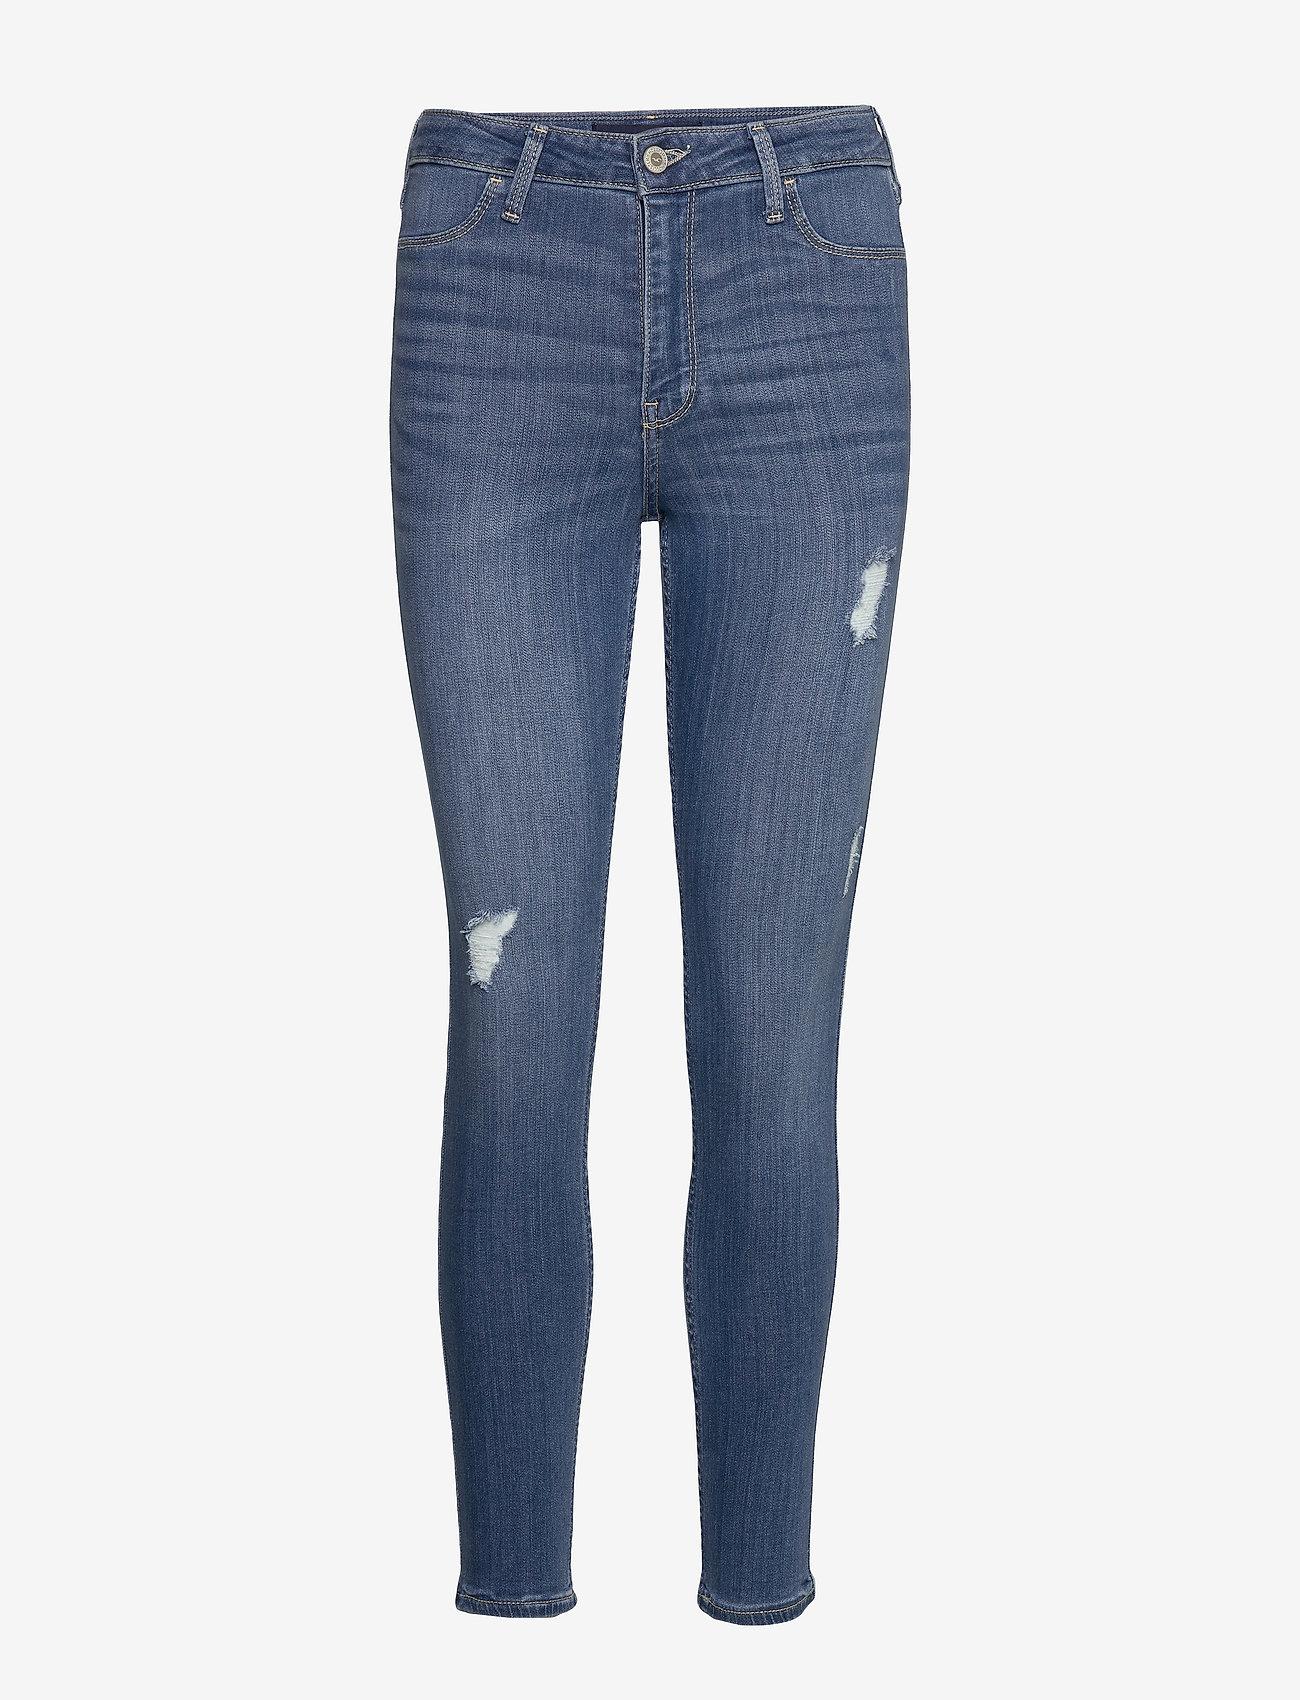 Hollister - Jeans - skinny jeans - medium destroy - 0